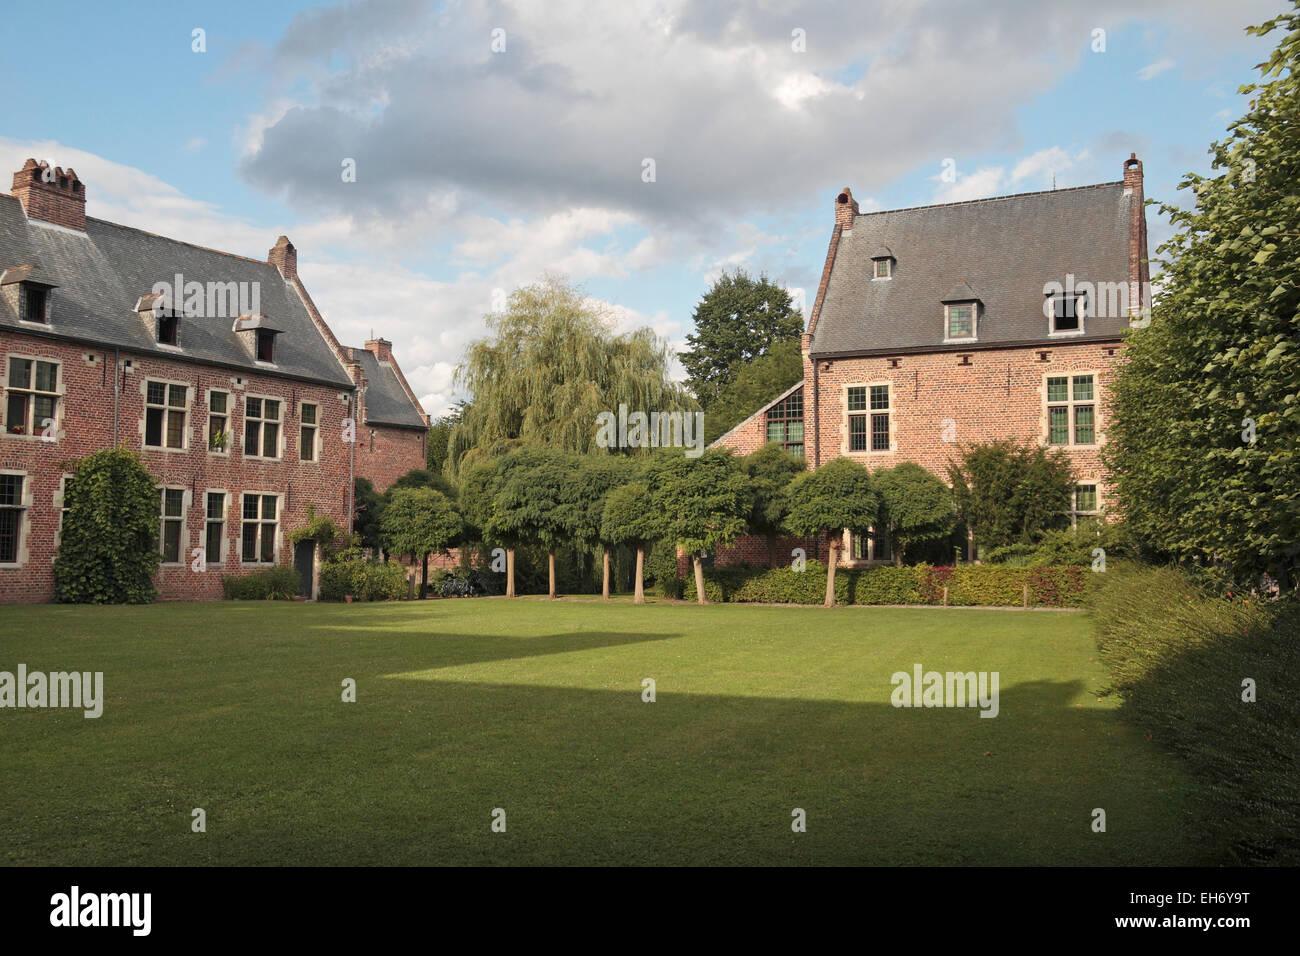 Grass area inside the peaceful Grand Béguinage (Groot Begijnhof), Leuven, Flemish Brabant, Belgium. - Stock Image